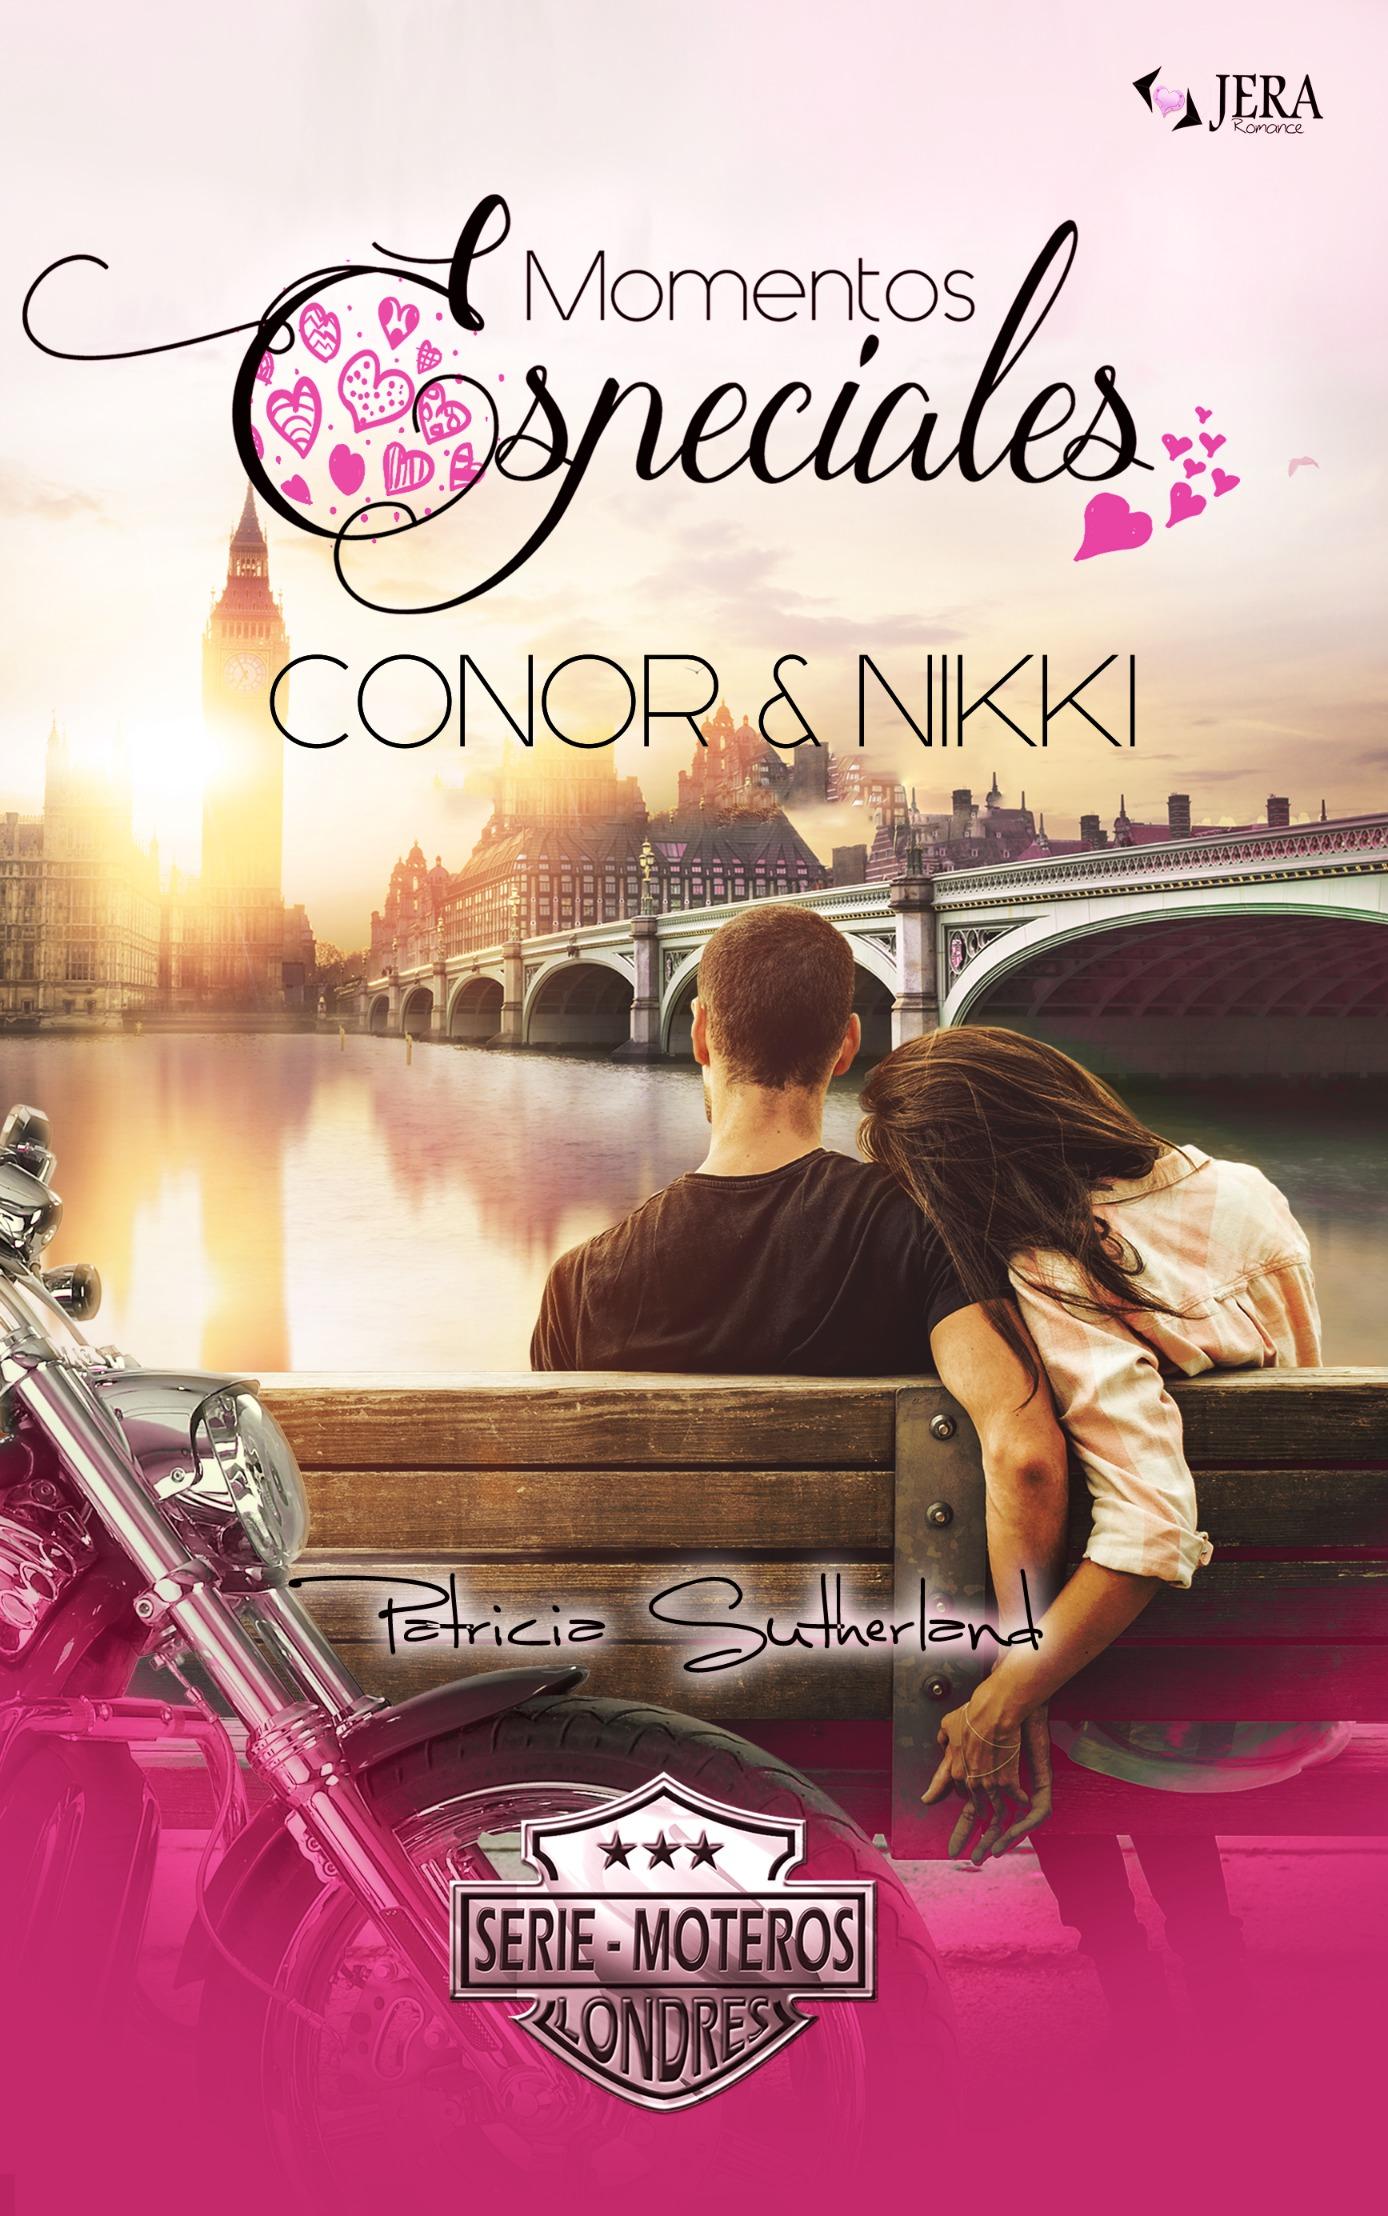 Momentos Especiales Conor & Nikki. Extras Serie Moteros 9